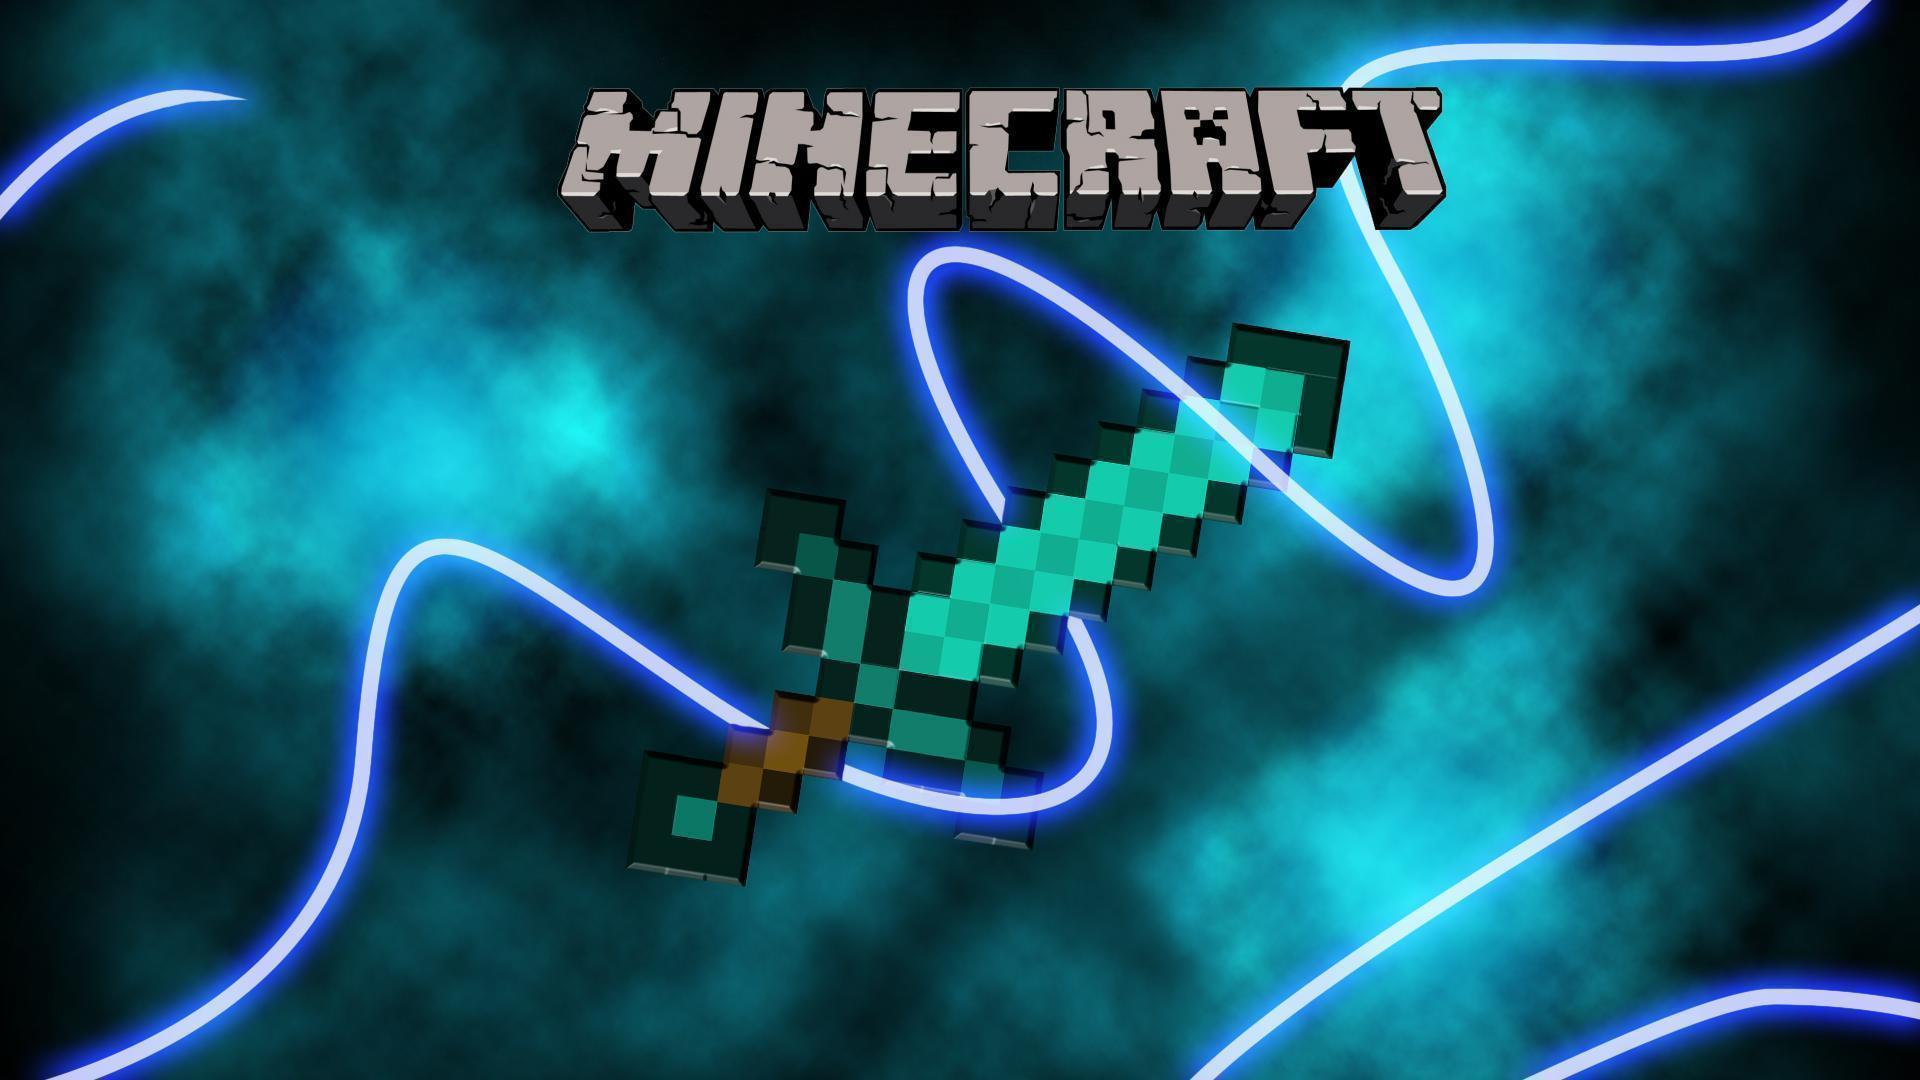 Minecraft HD Wallpaper 2022